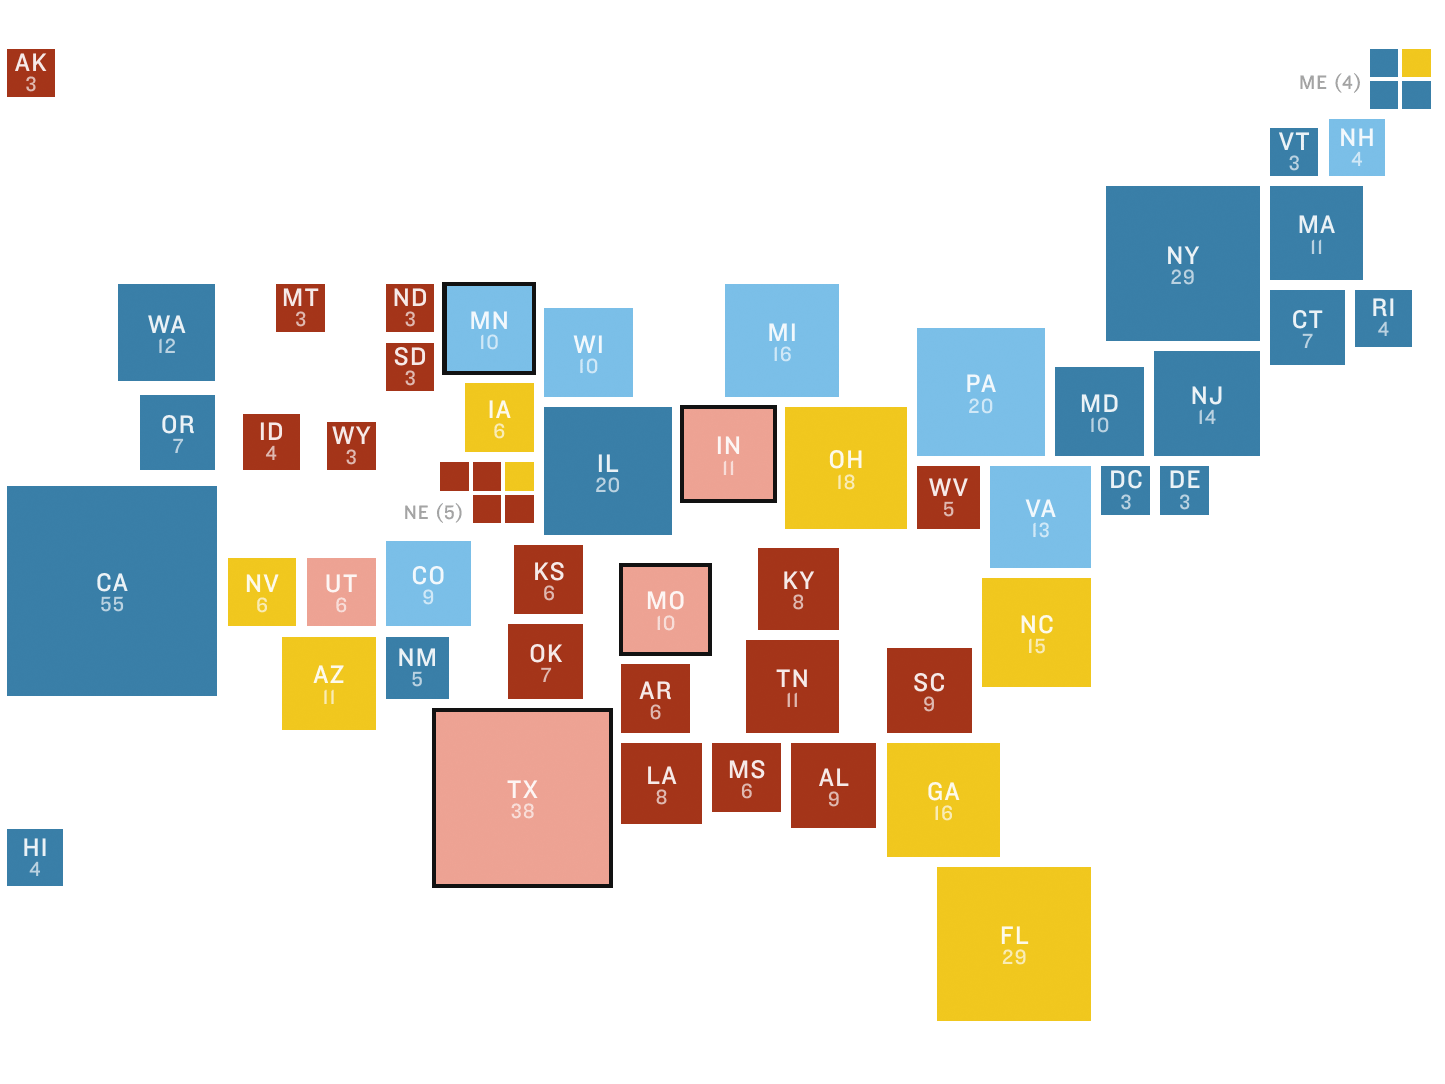 NPR Election 2016 Battleground Map